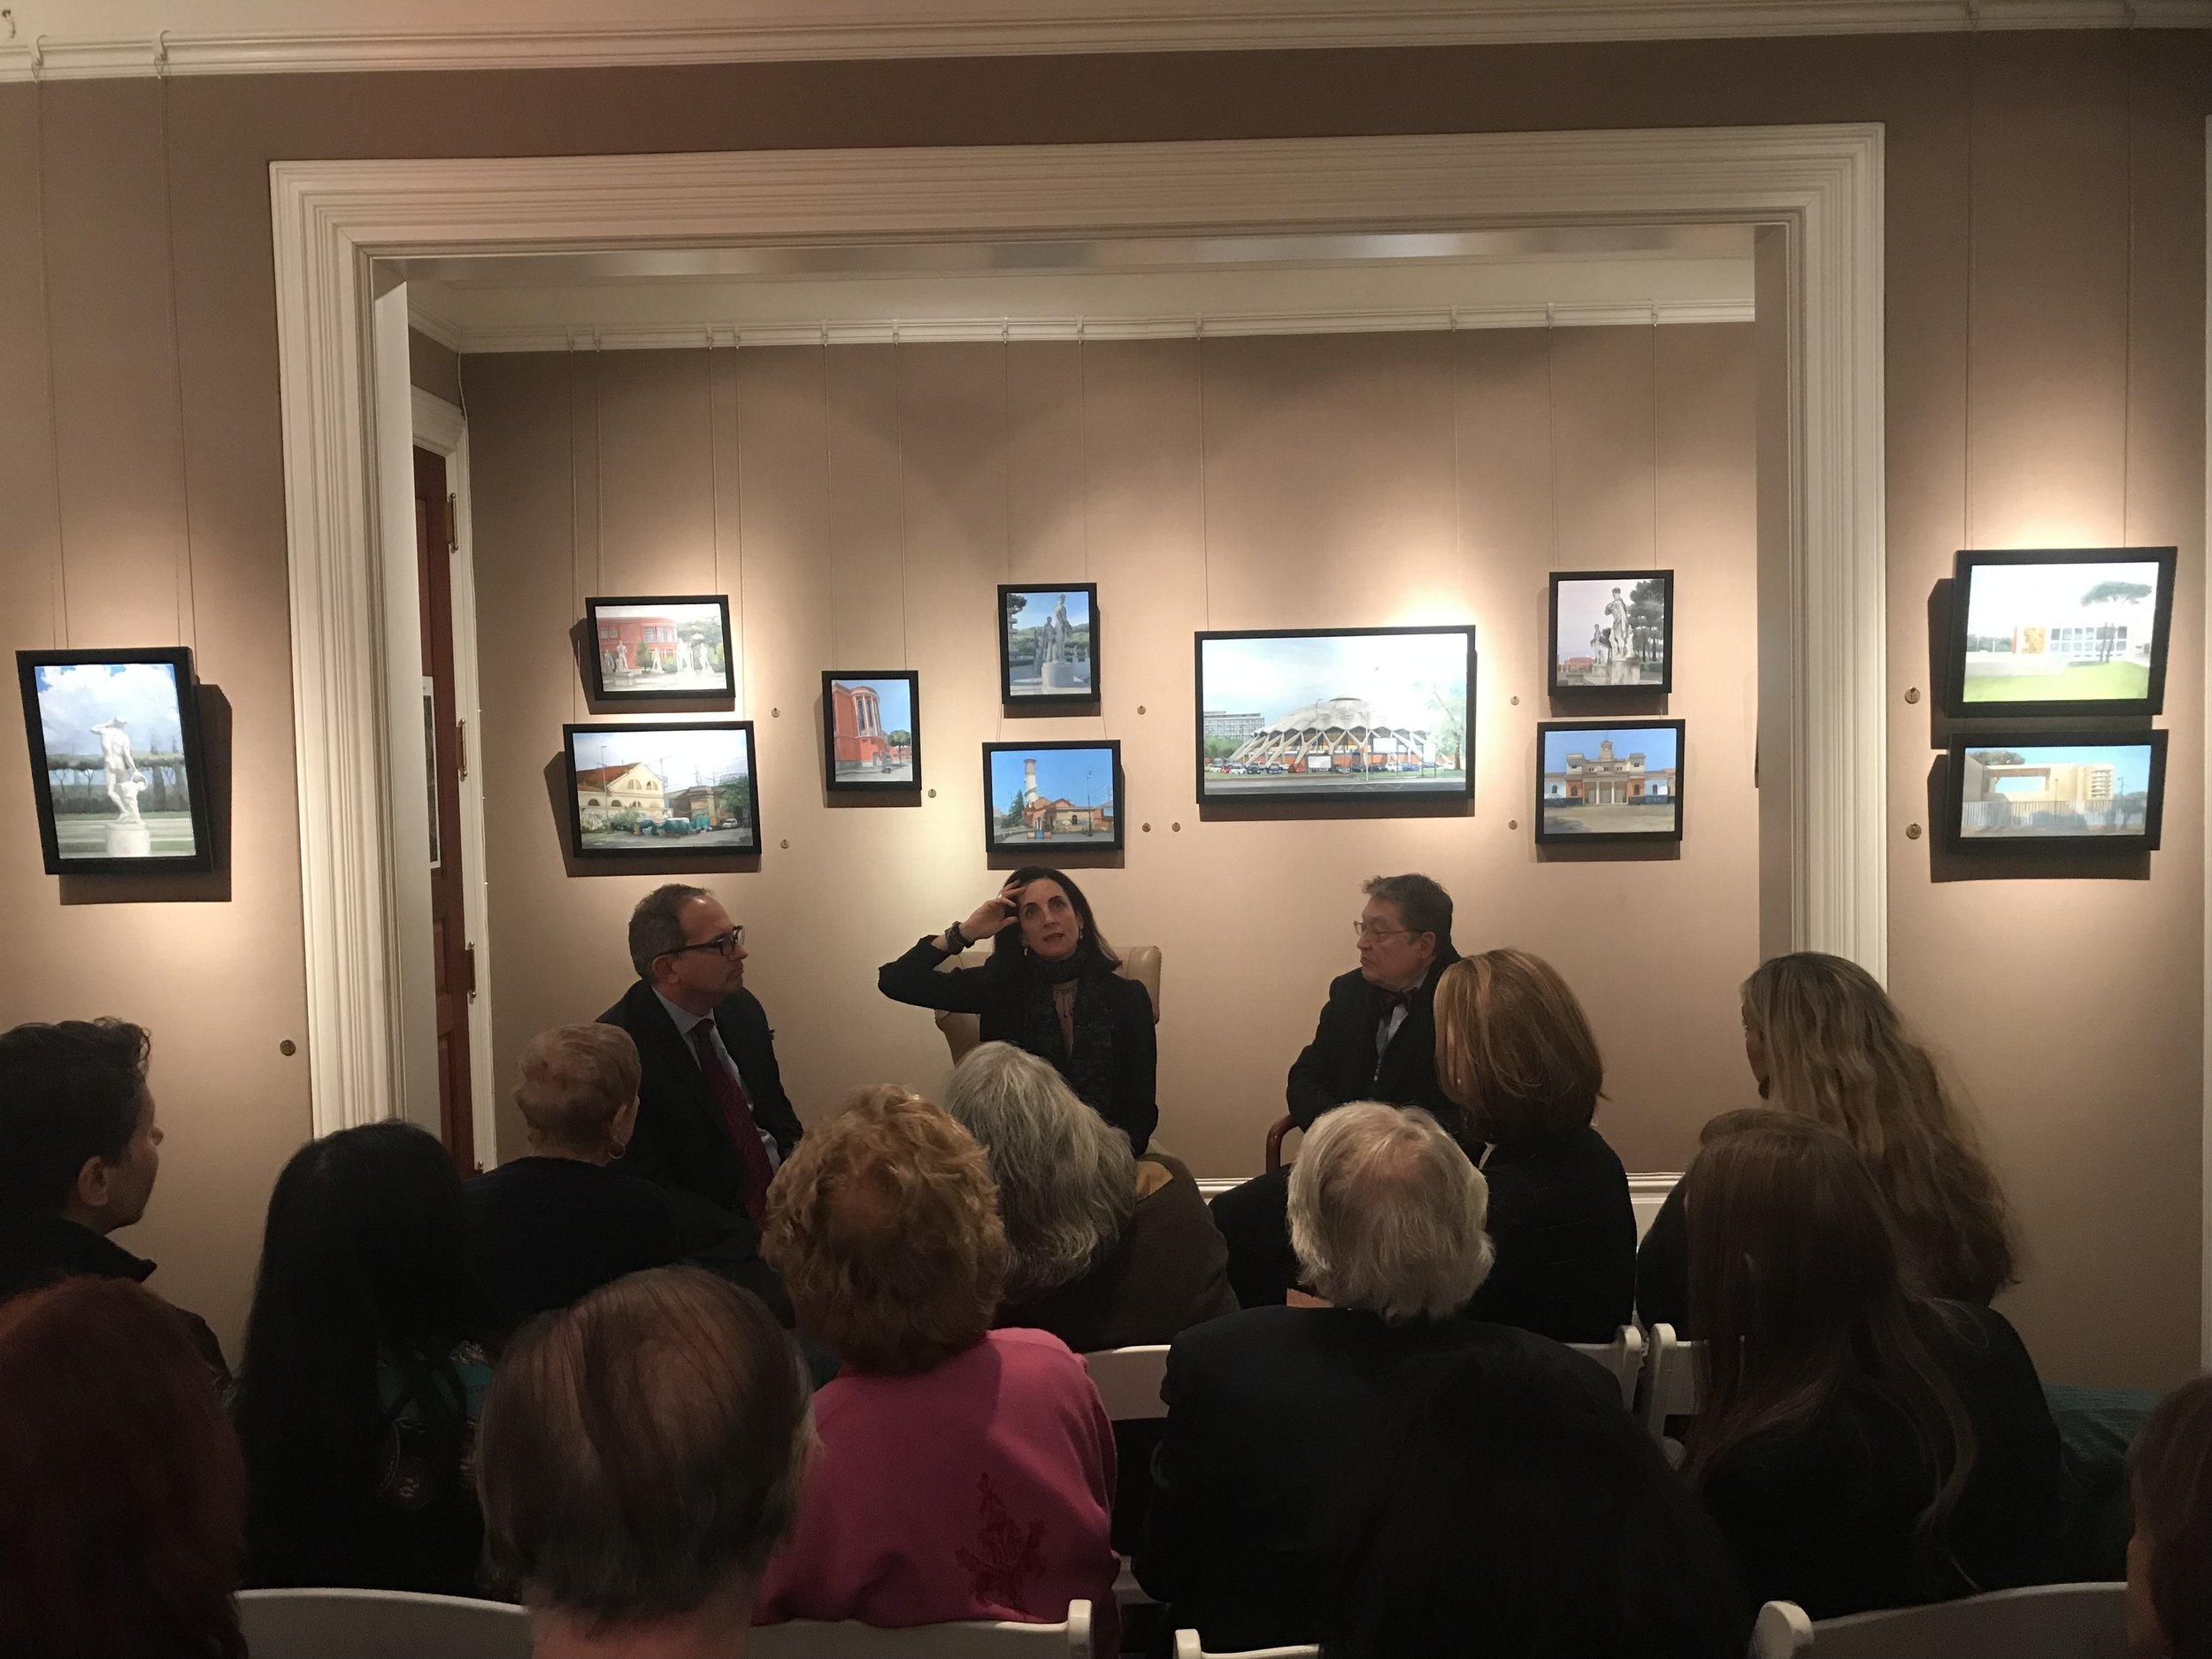 PAMELA TALESE THE ARTIST IN CONVERSATION WITH ROBERT SIMON AND LUIGI BALLERINI - View 1